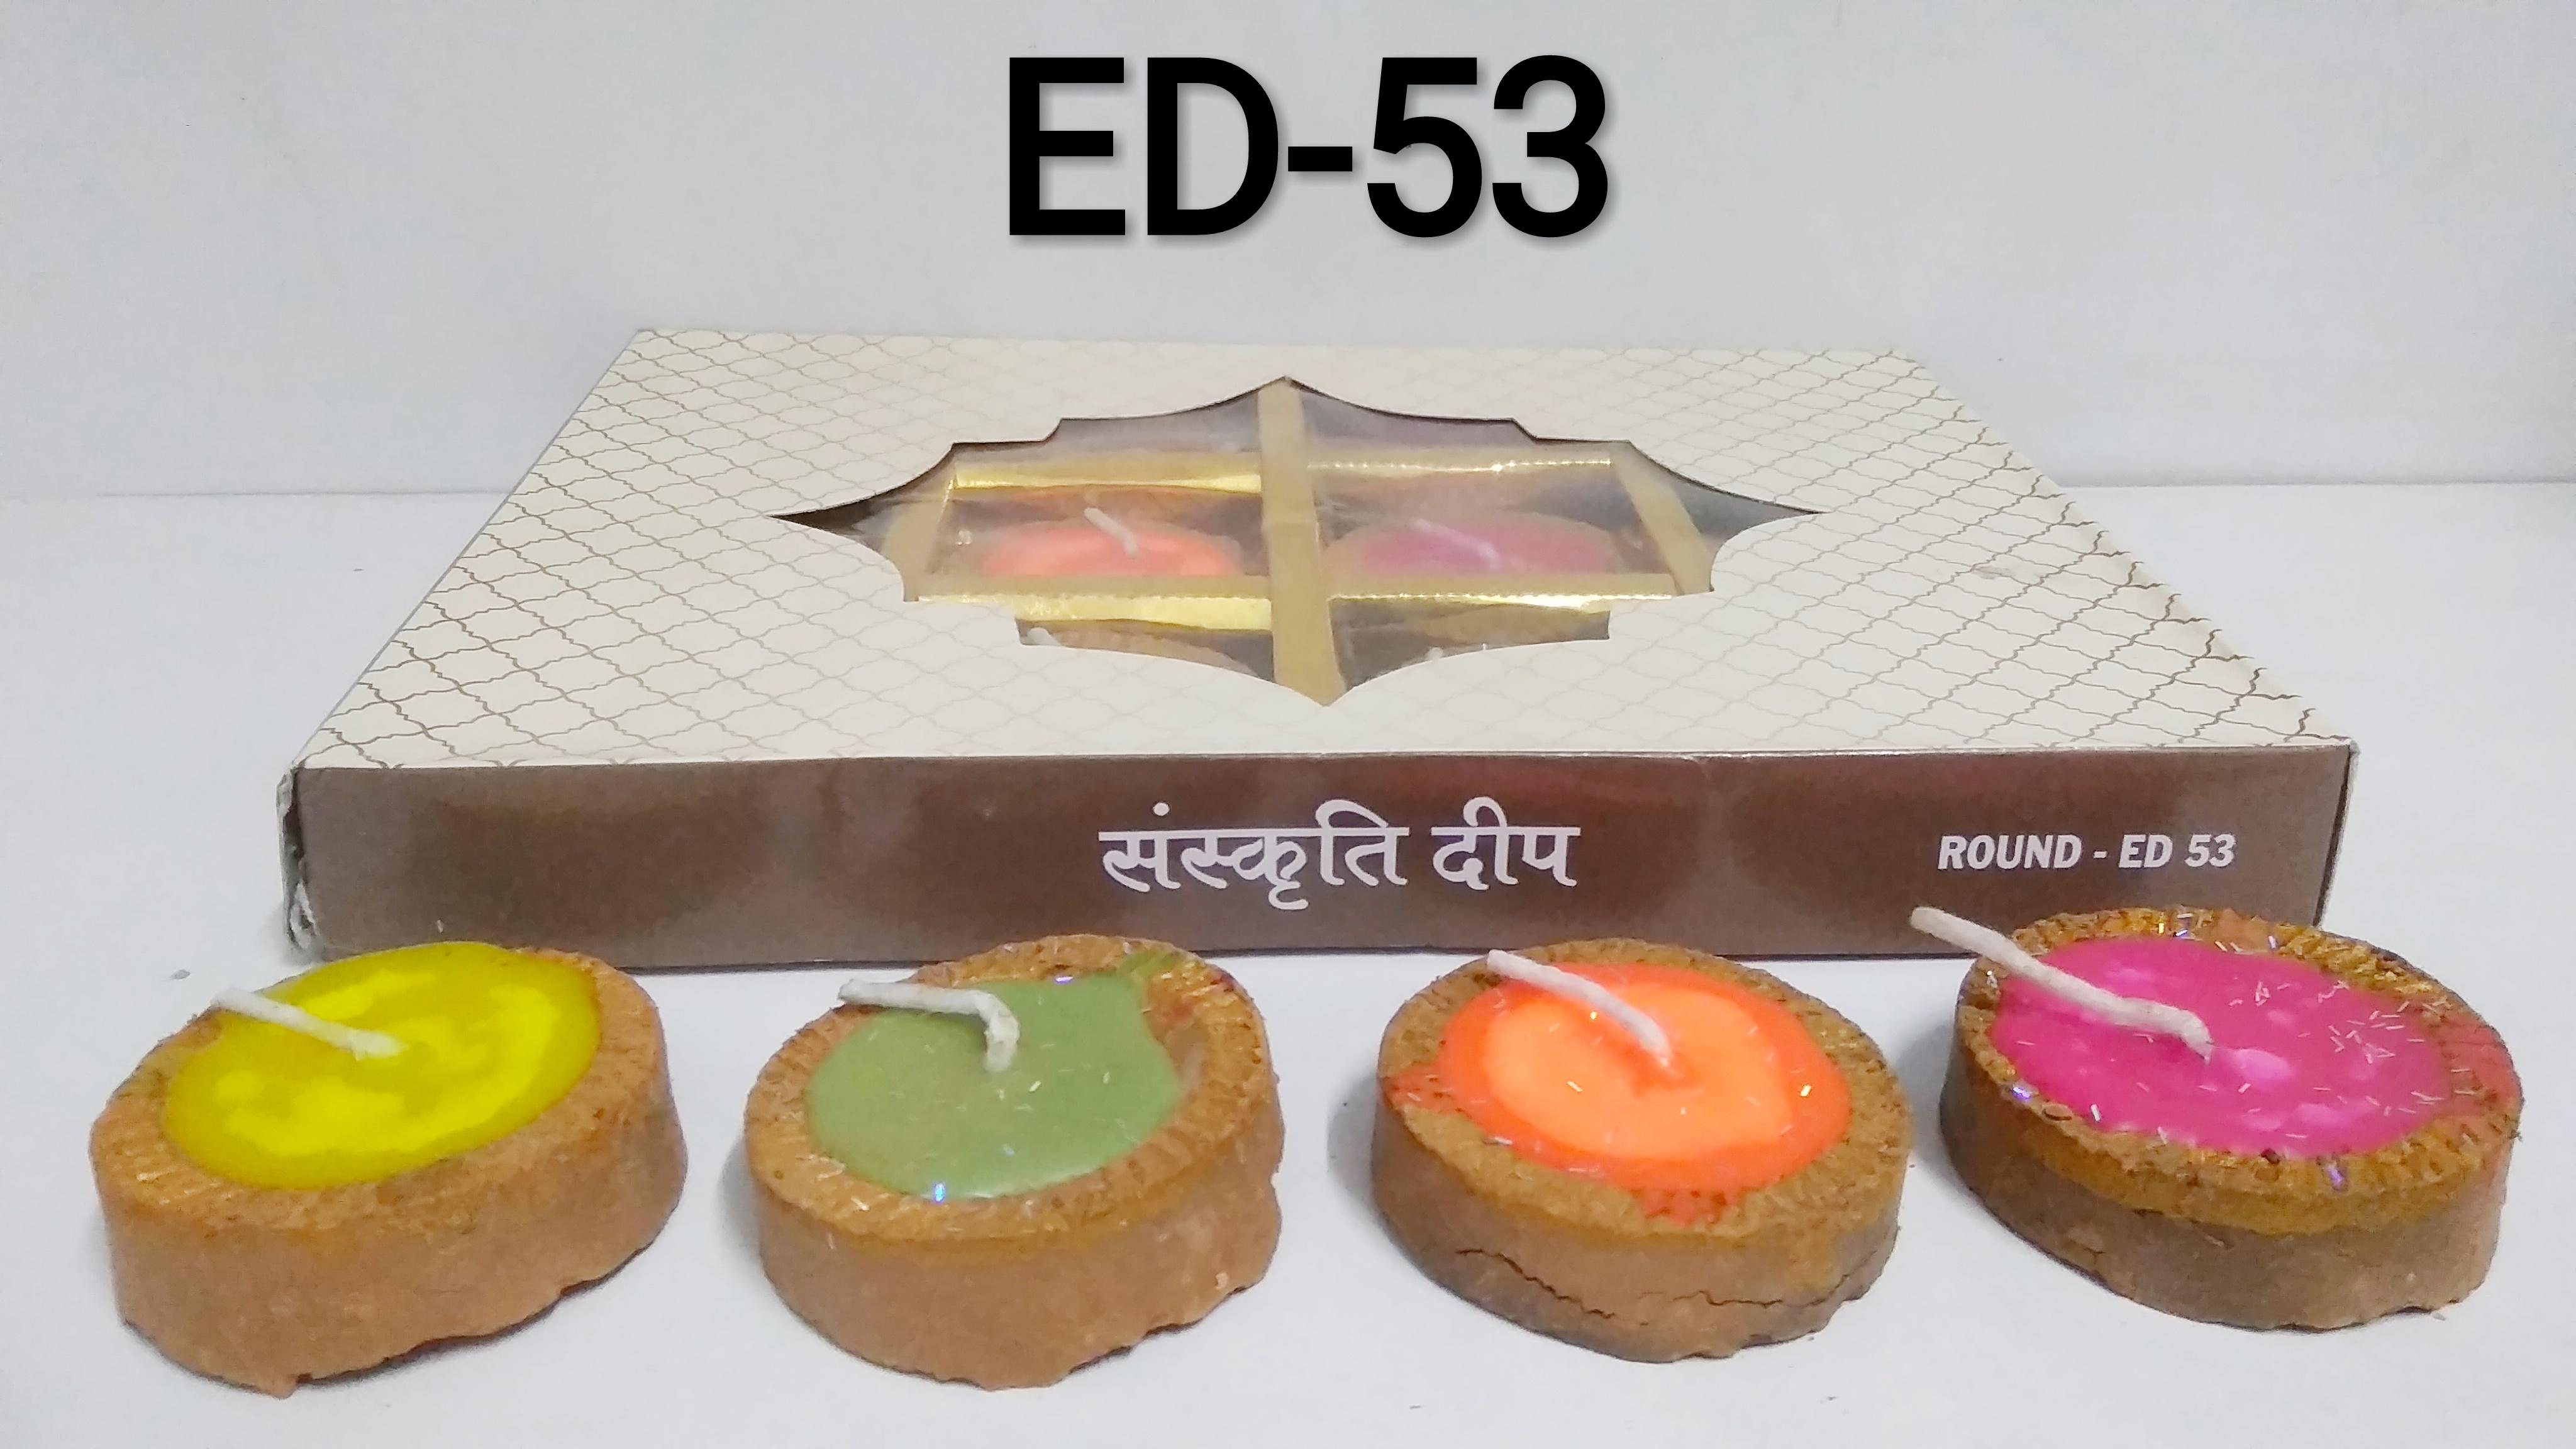 ED-53